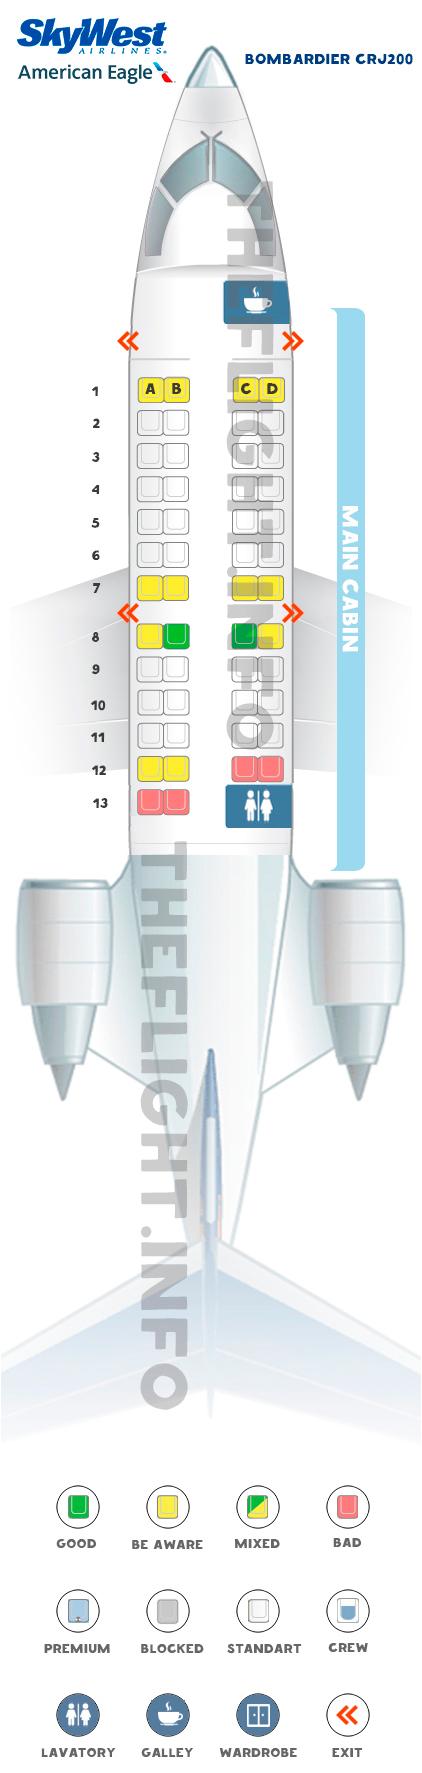 Seat Map Bombardier CRJ200 American Eagle